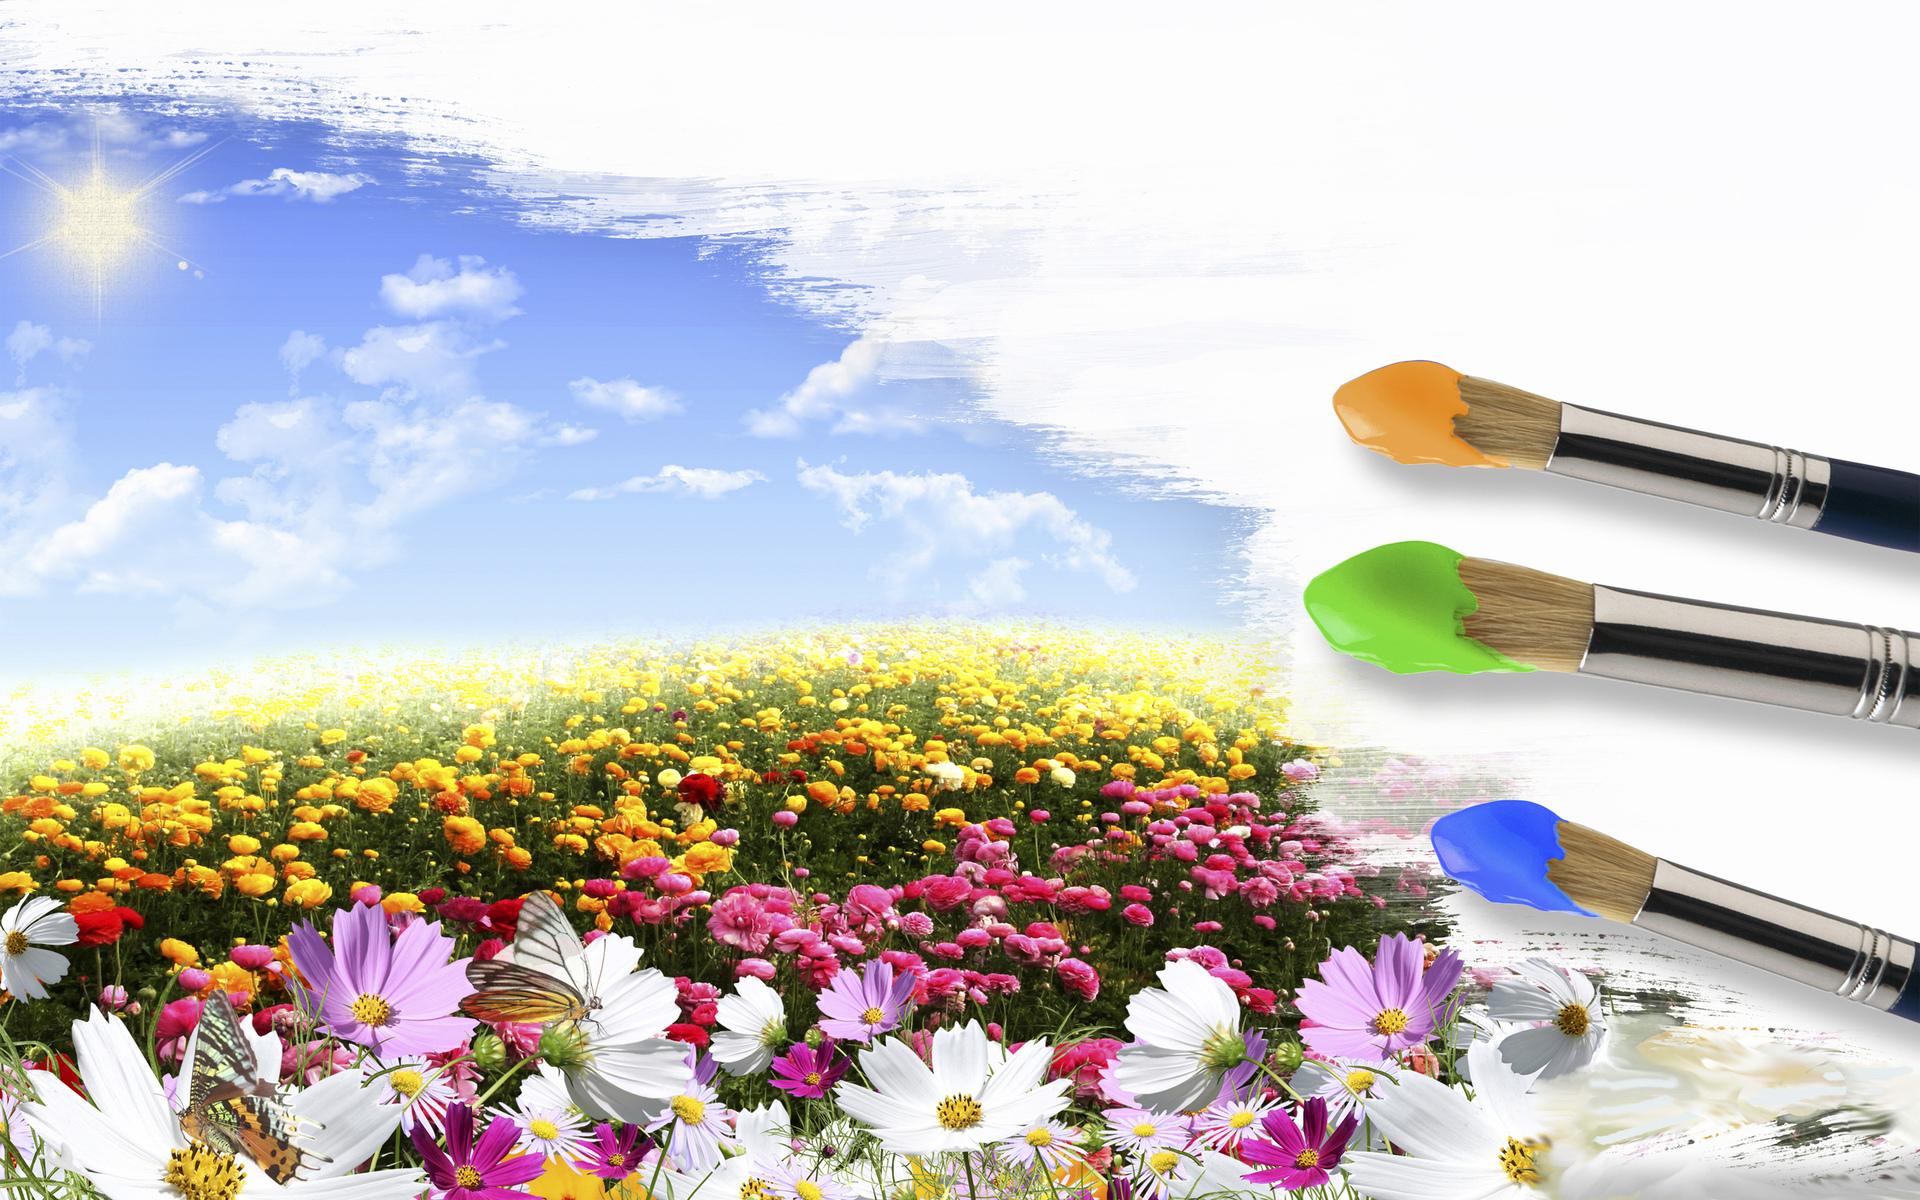 Ipad Retina Wallpaper Art Pain Brush: Art Pole_tsvetov Sky Brush Sun Summer Spring Sky Clouds